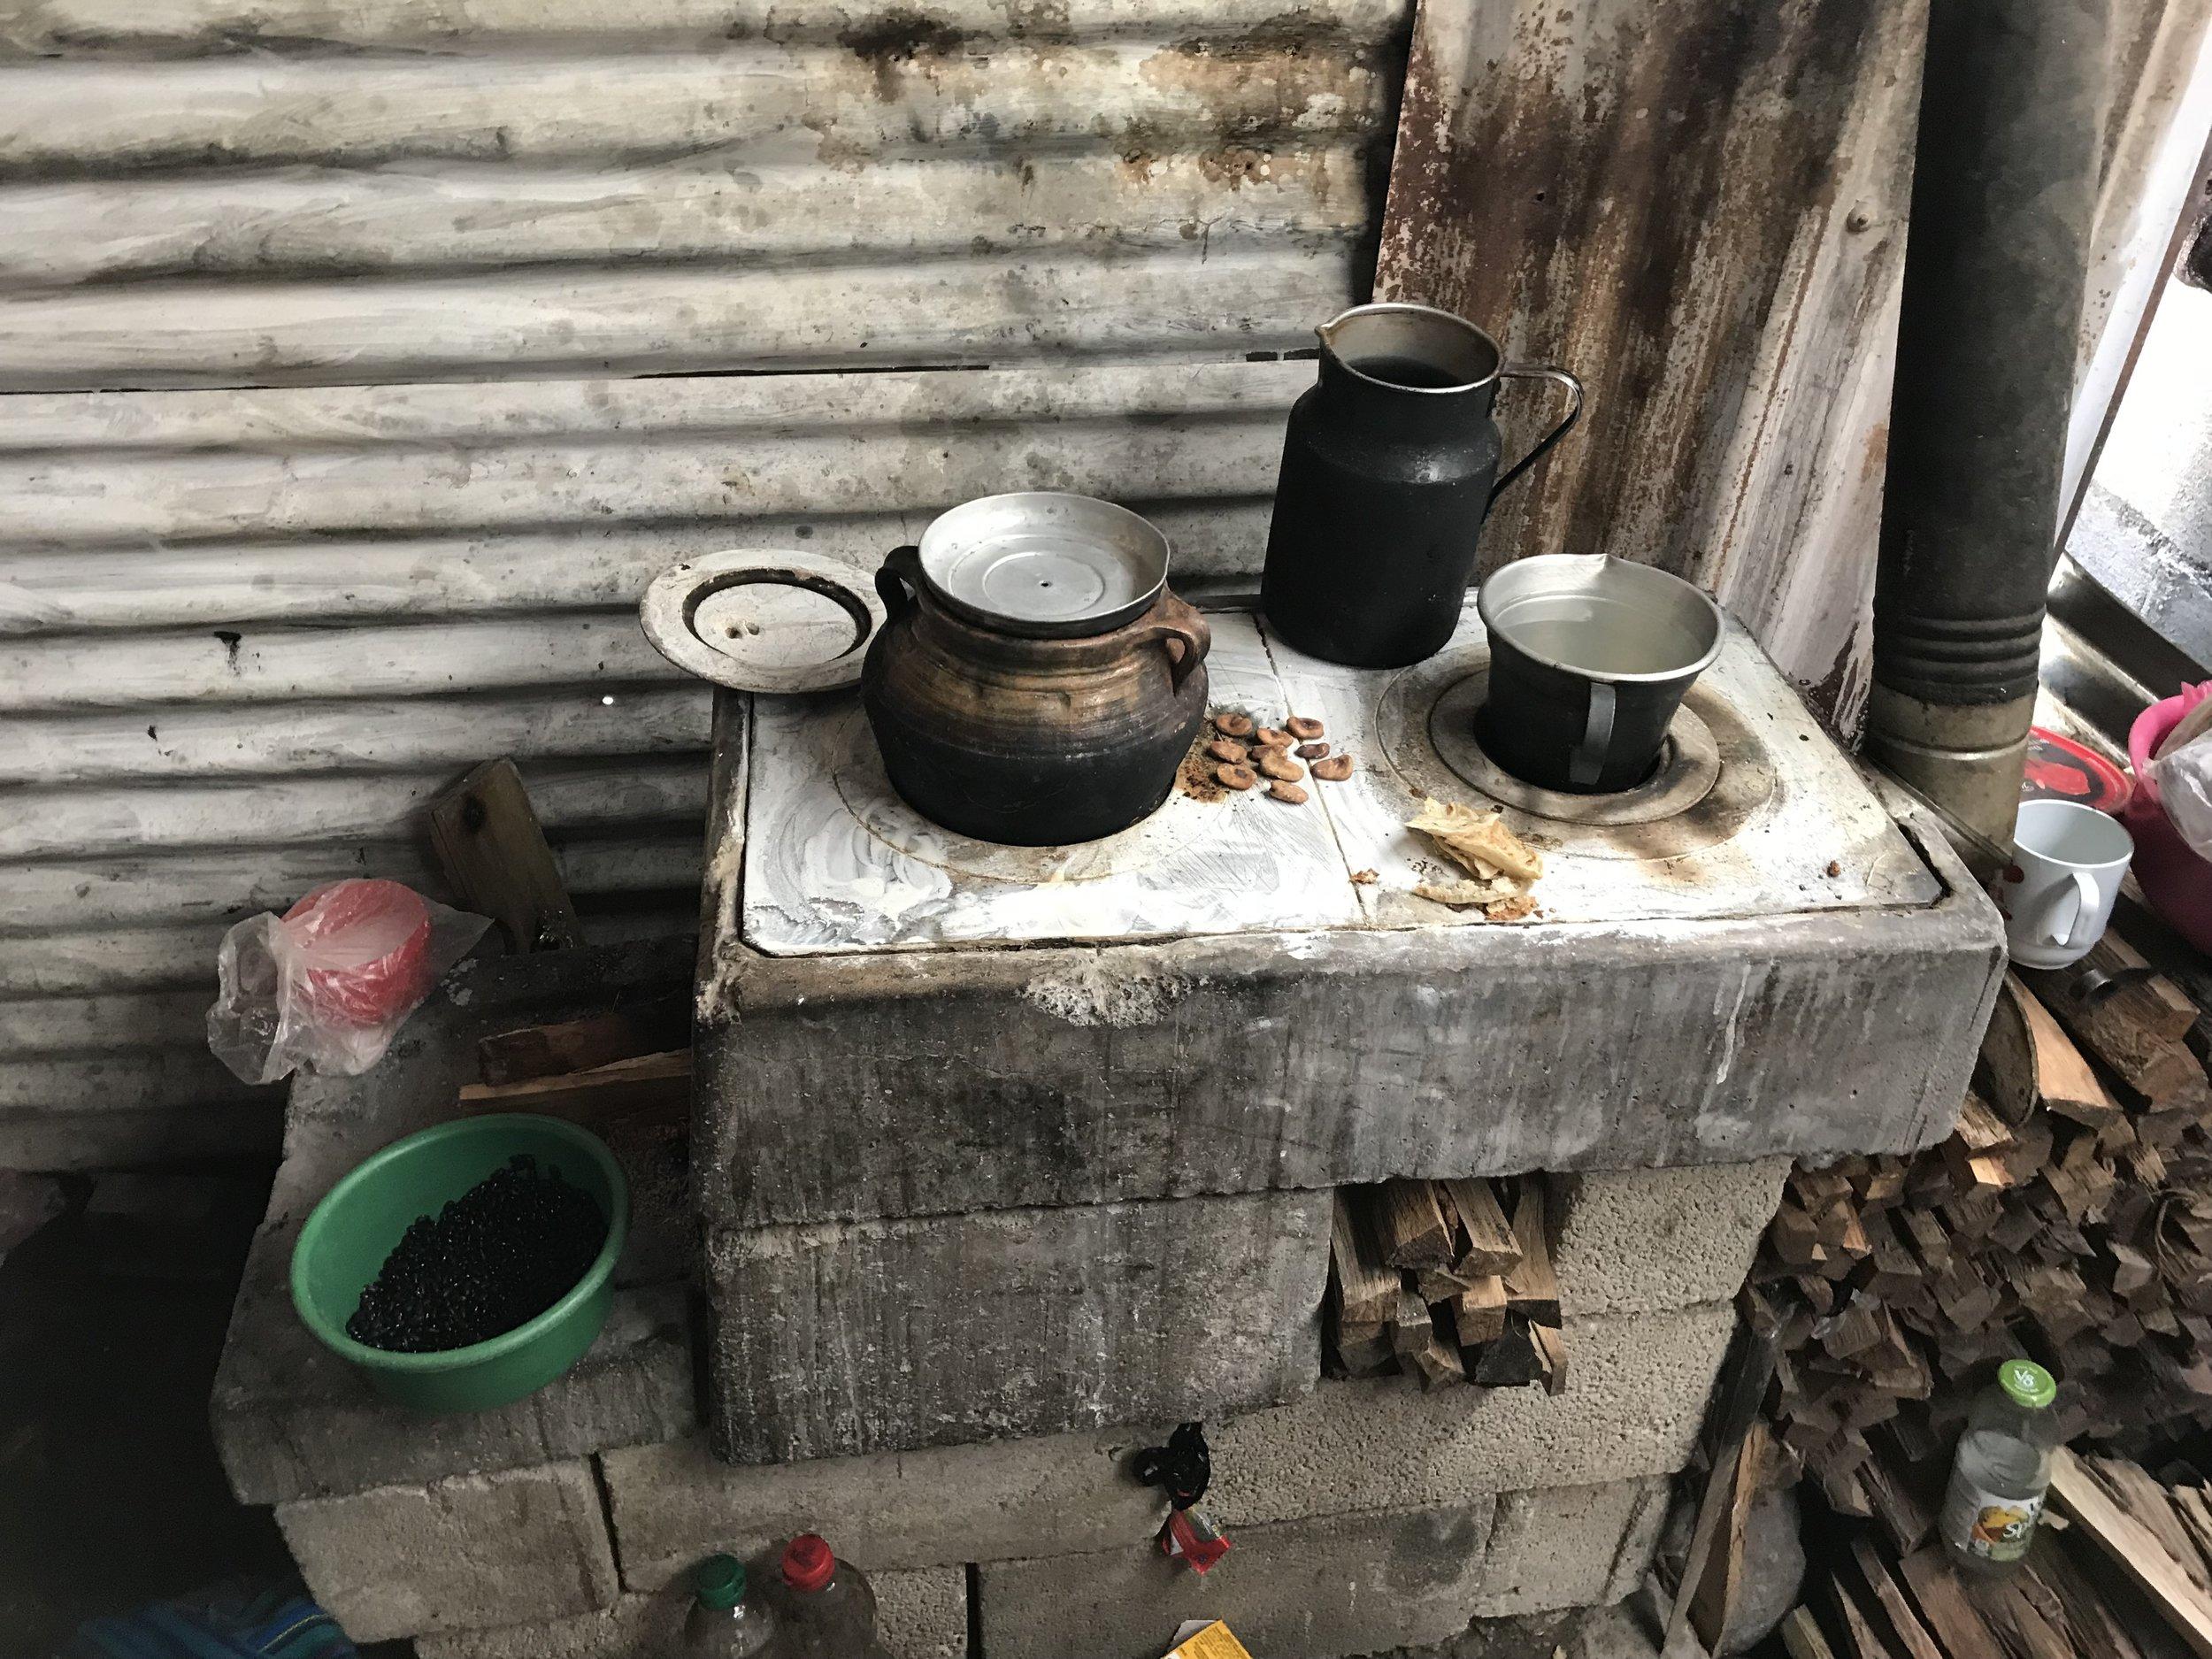 Older model wood burning stove